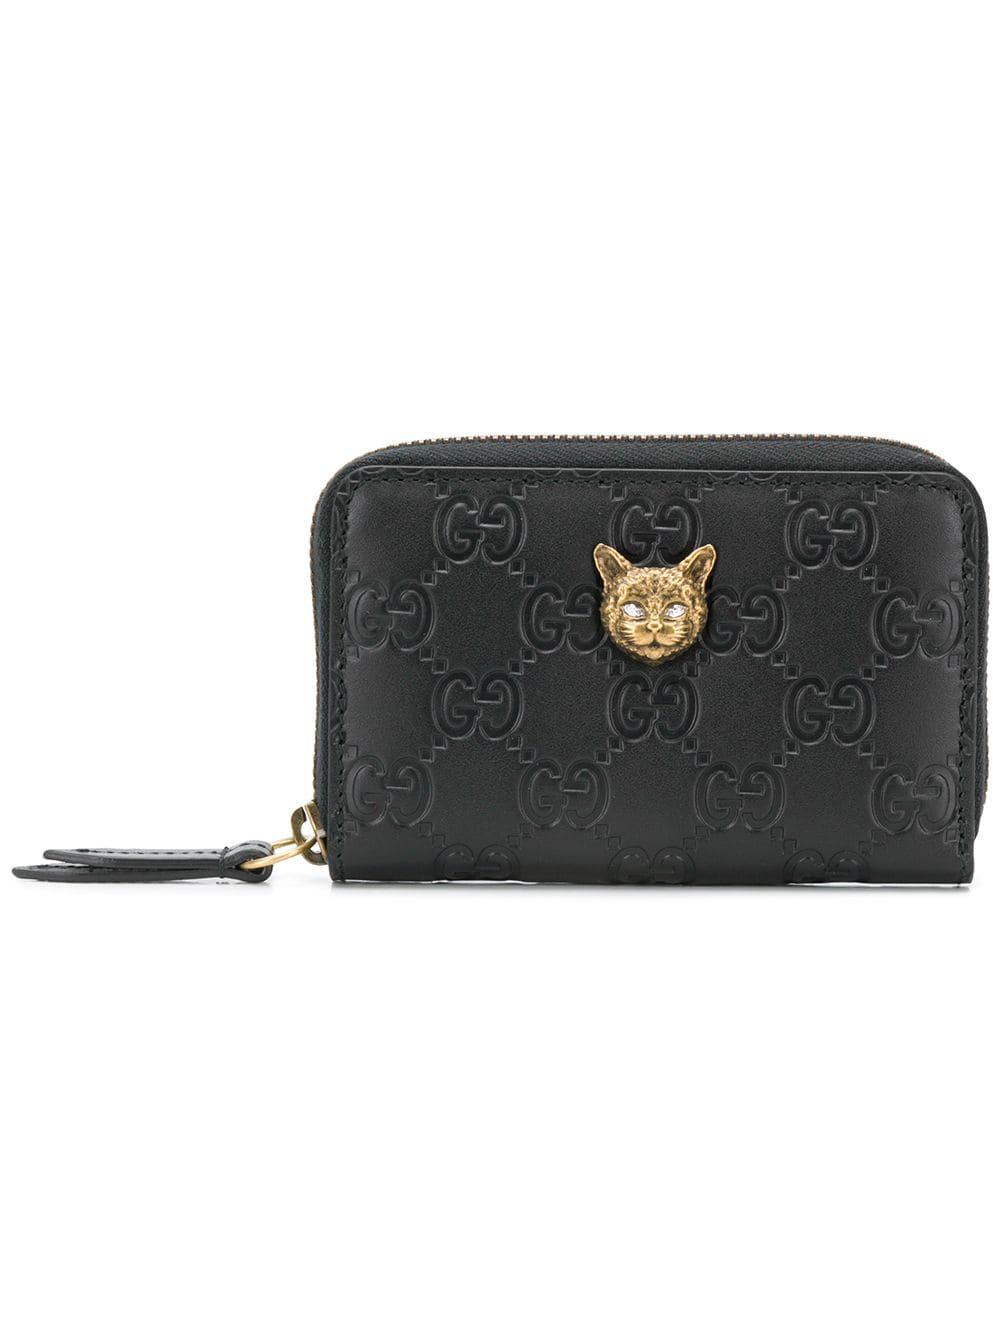 45c99e89795 Gucci Signature Card Case With Cat - Black